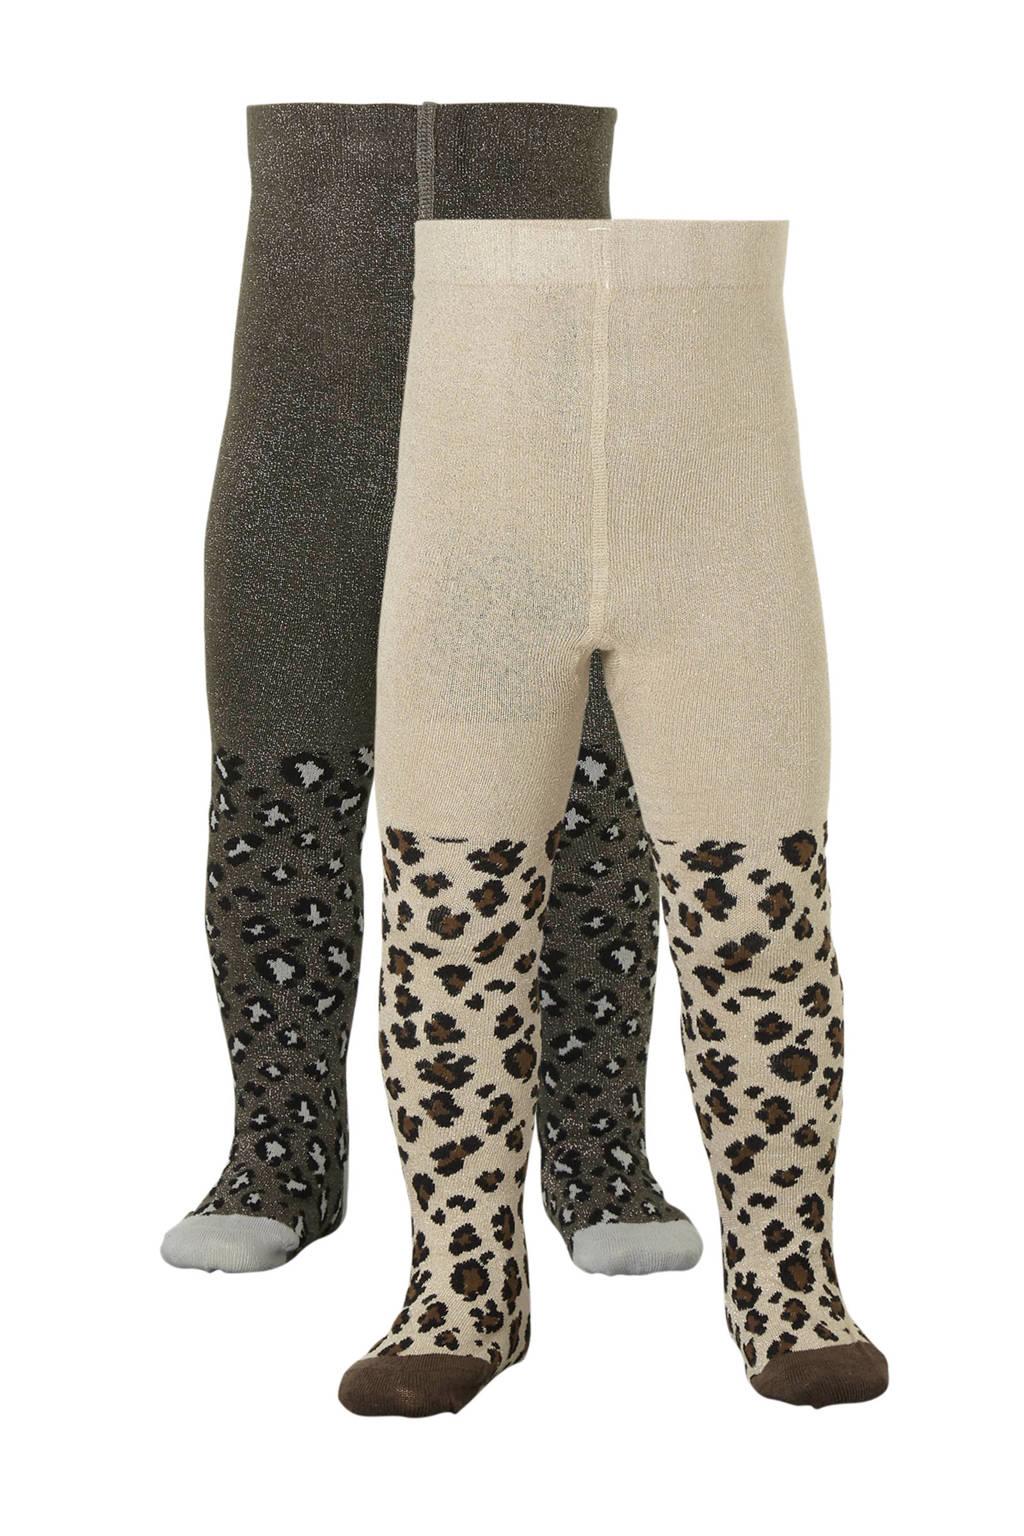 Apollo panterprint maillot set van twee paar, bruin multi